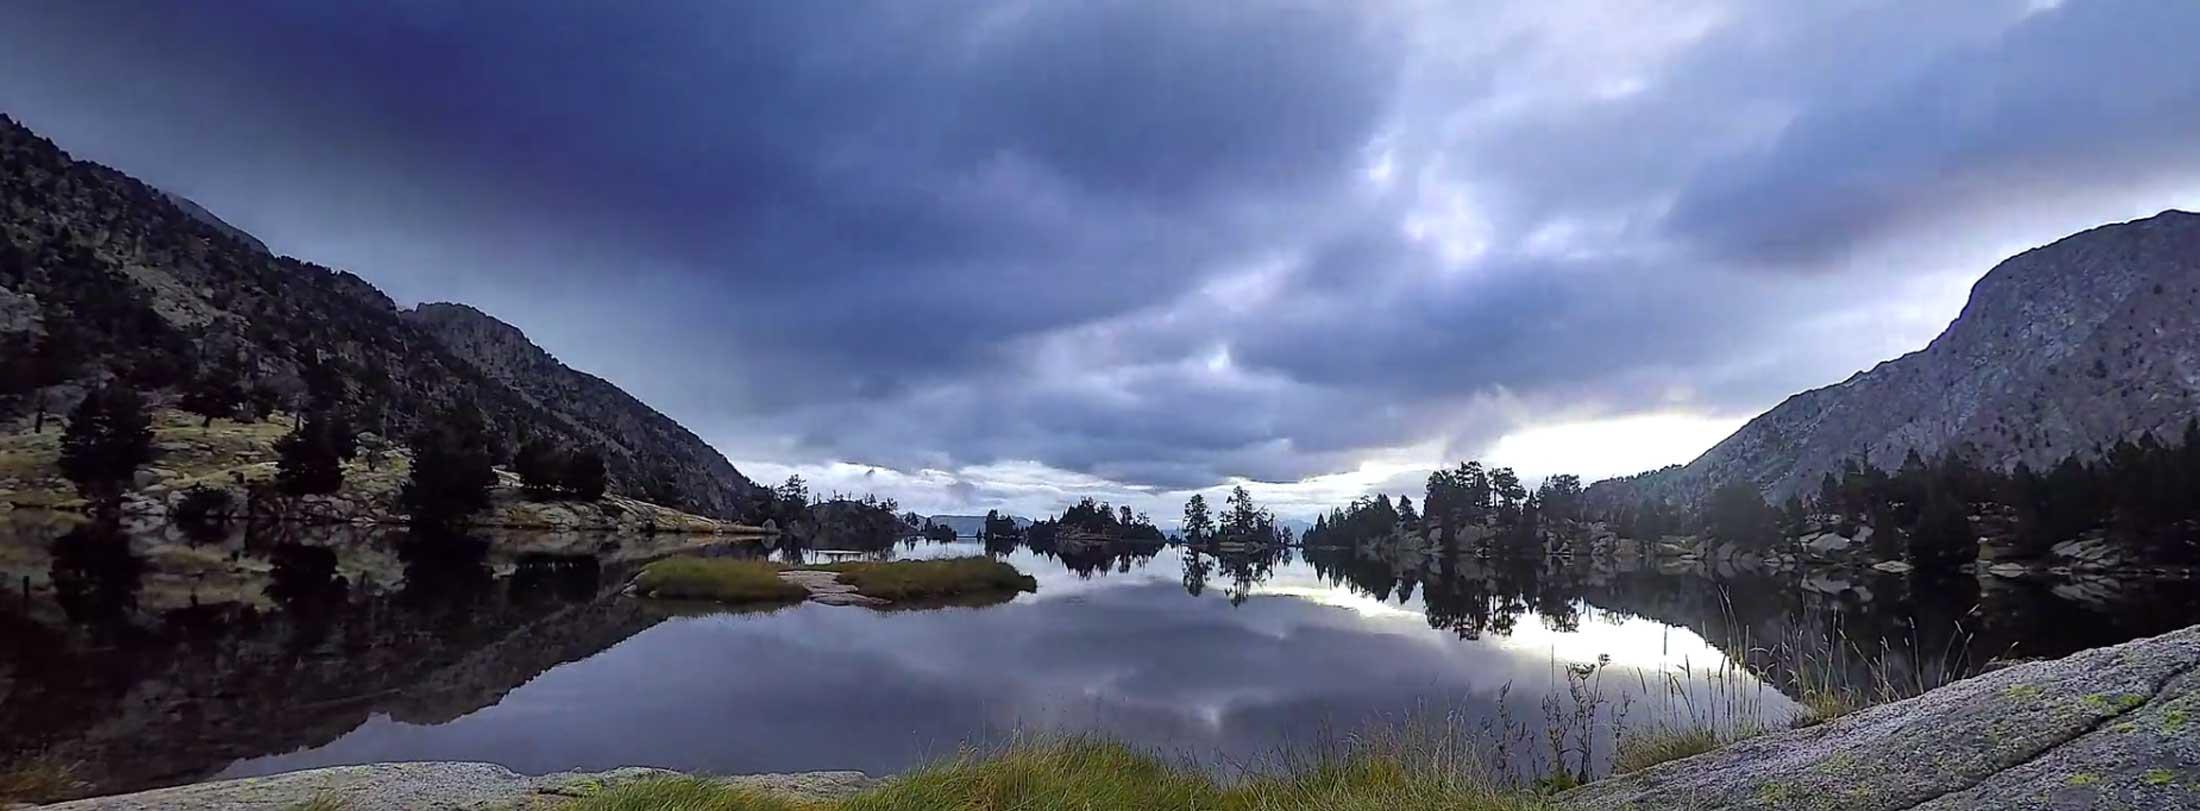 Parque Nacional de Aigües Tortes i Estany de Sant Maurici